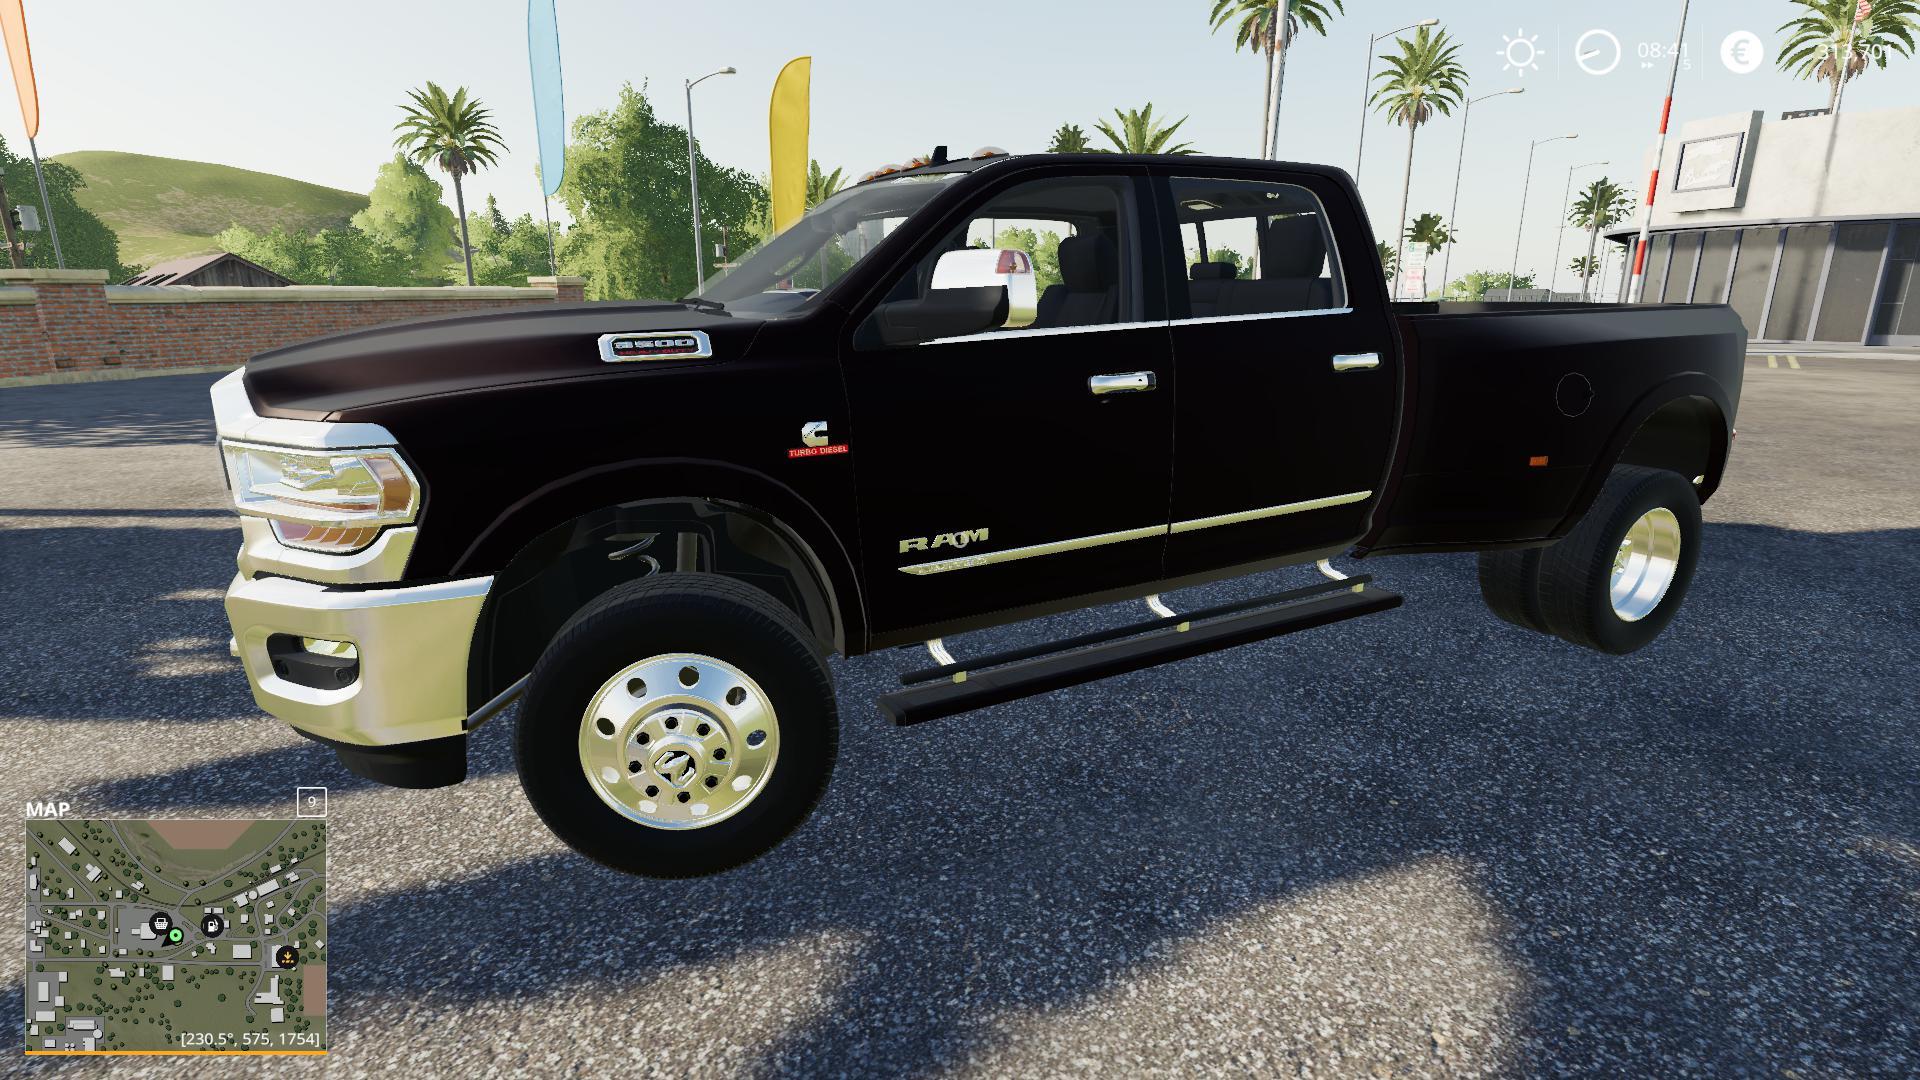 Dodge Ram 3500 Revised V3 0 1 Fs19 Mod Fs19 Net